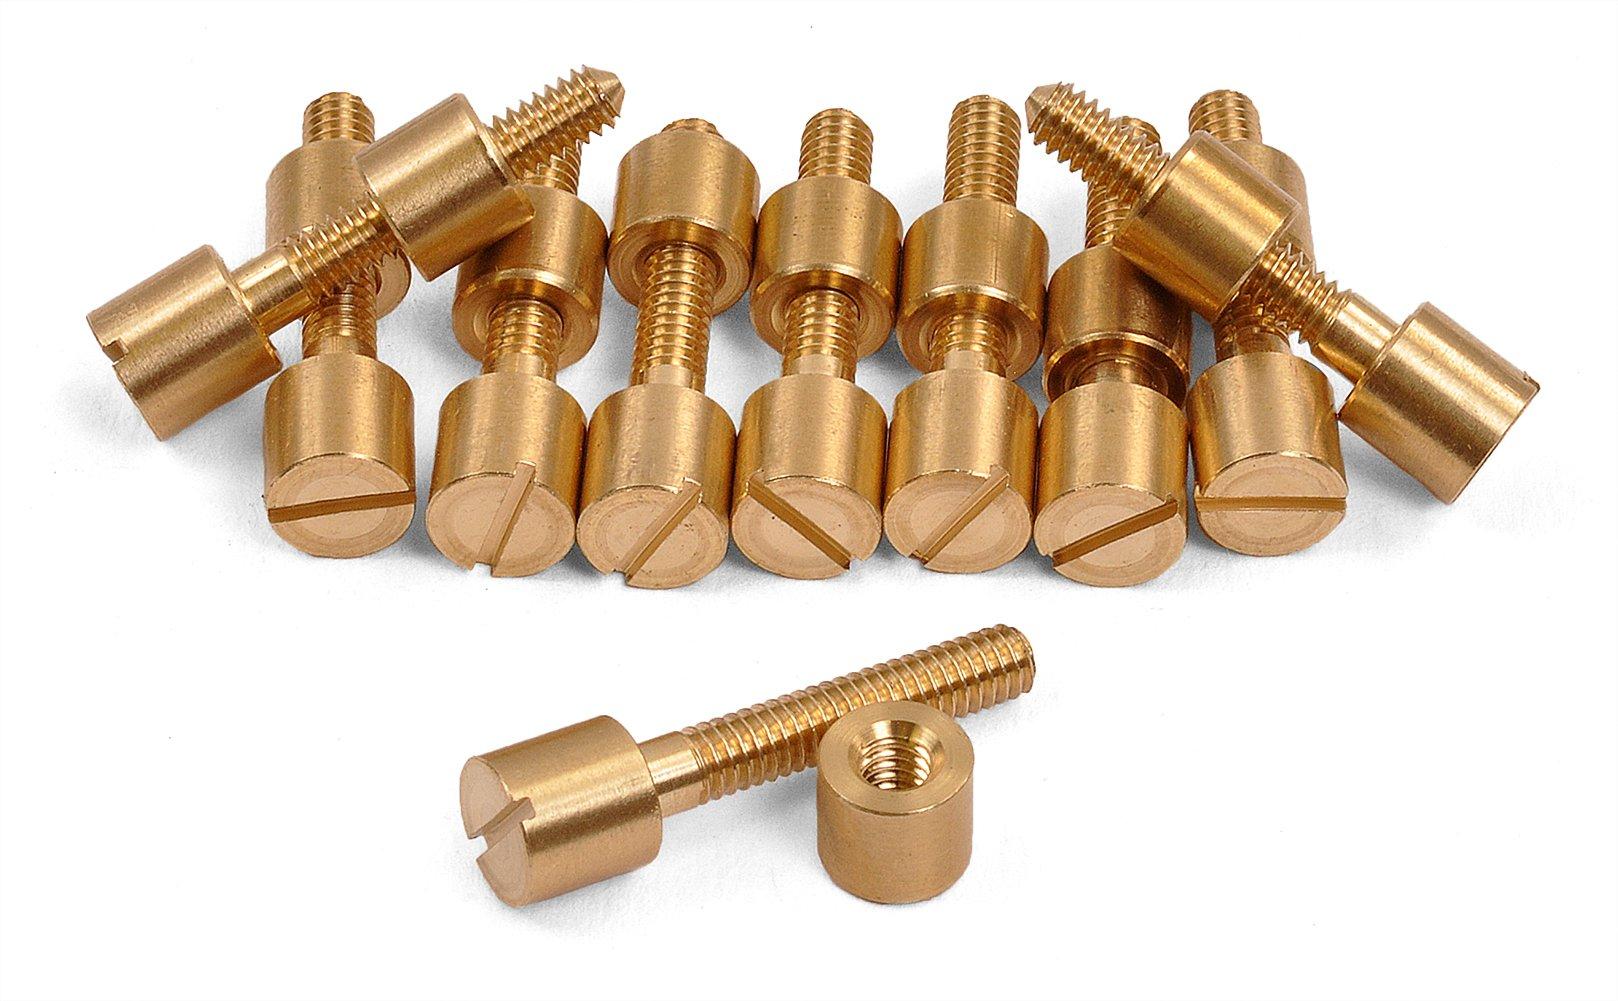 10 Pack of Brass Screw Fasteners, 5/16'' Diameter Head -- 600B